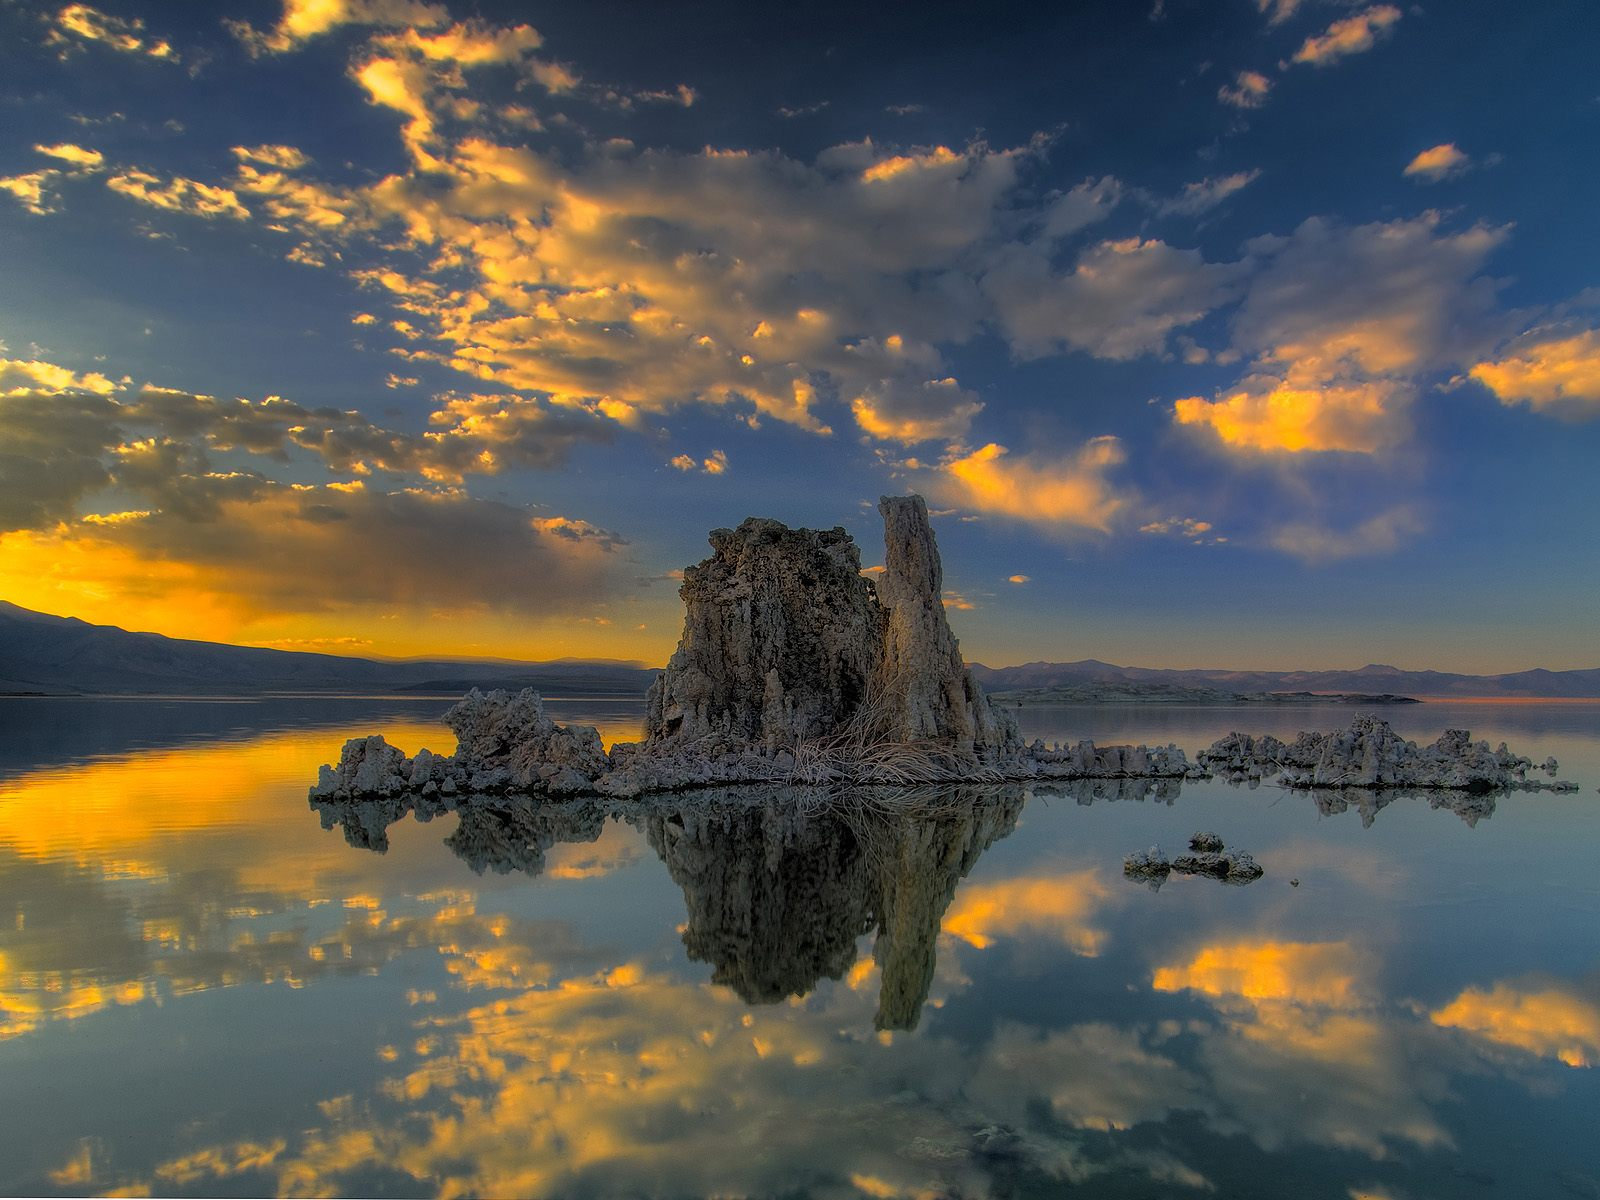 http://3.bp.blogspot.com/-VeH3QYY9Jgw/TcqjBMuk84I/AAAAAAAACgs/Prchrzn9tCU/s1600/winter+scenes+1+%252835%2529.jpg